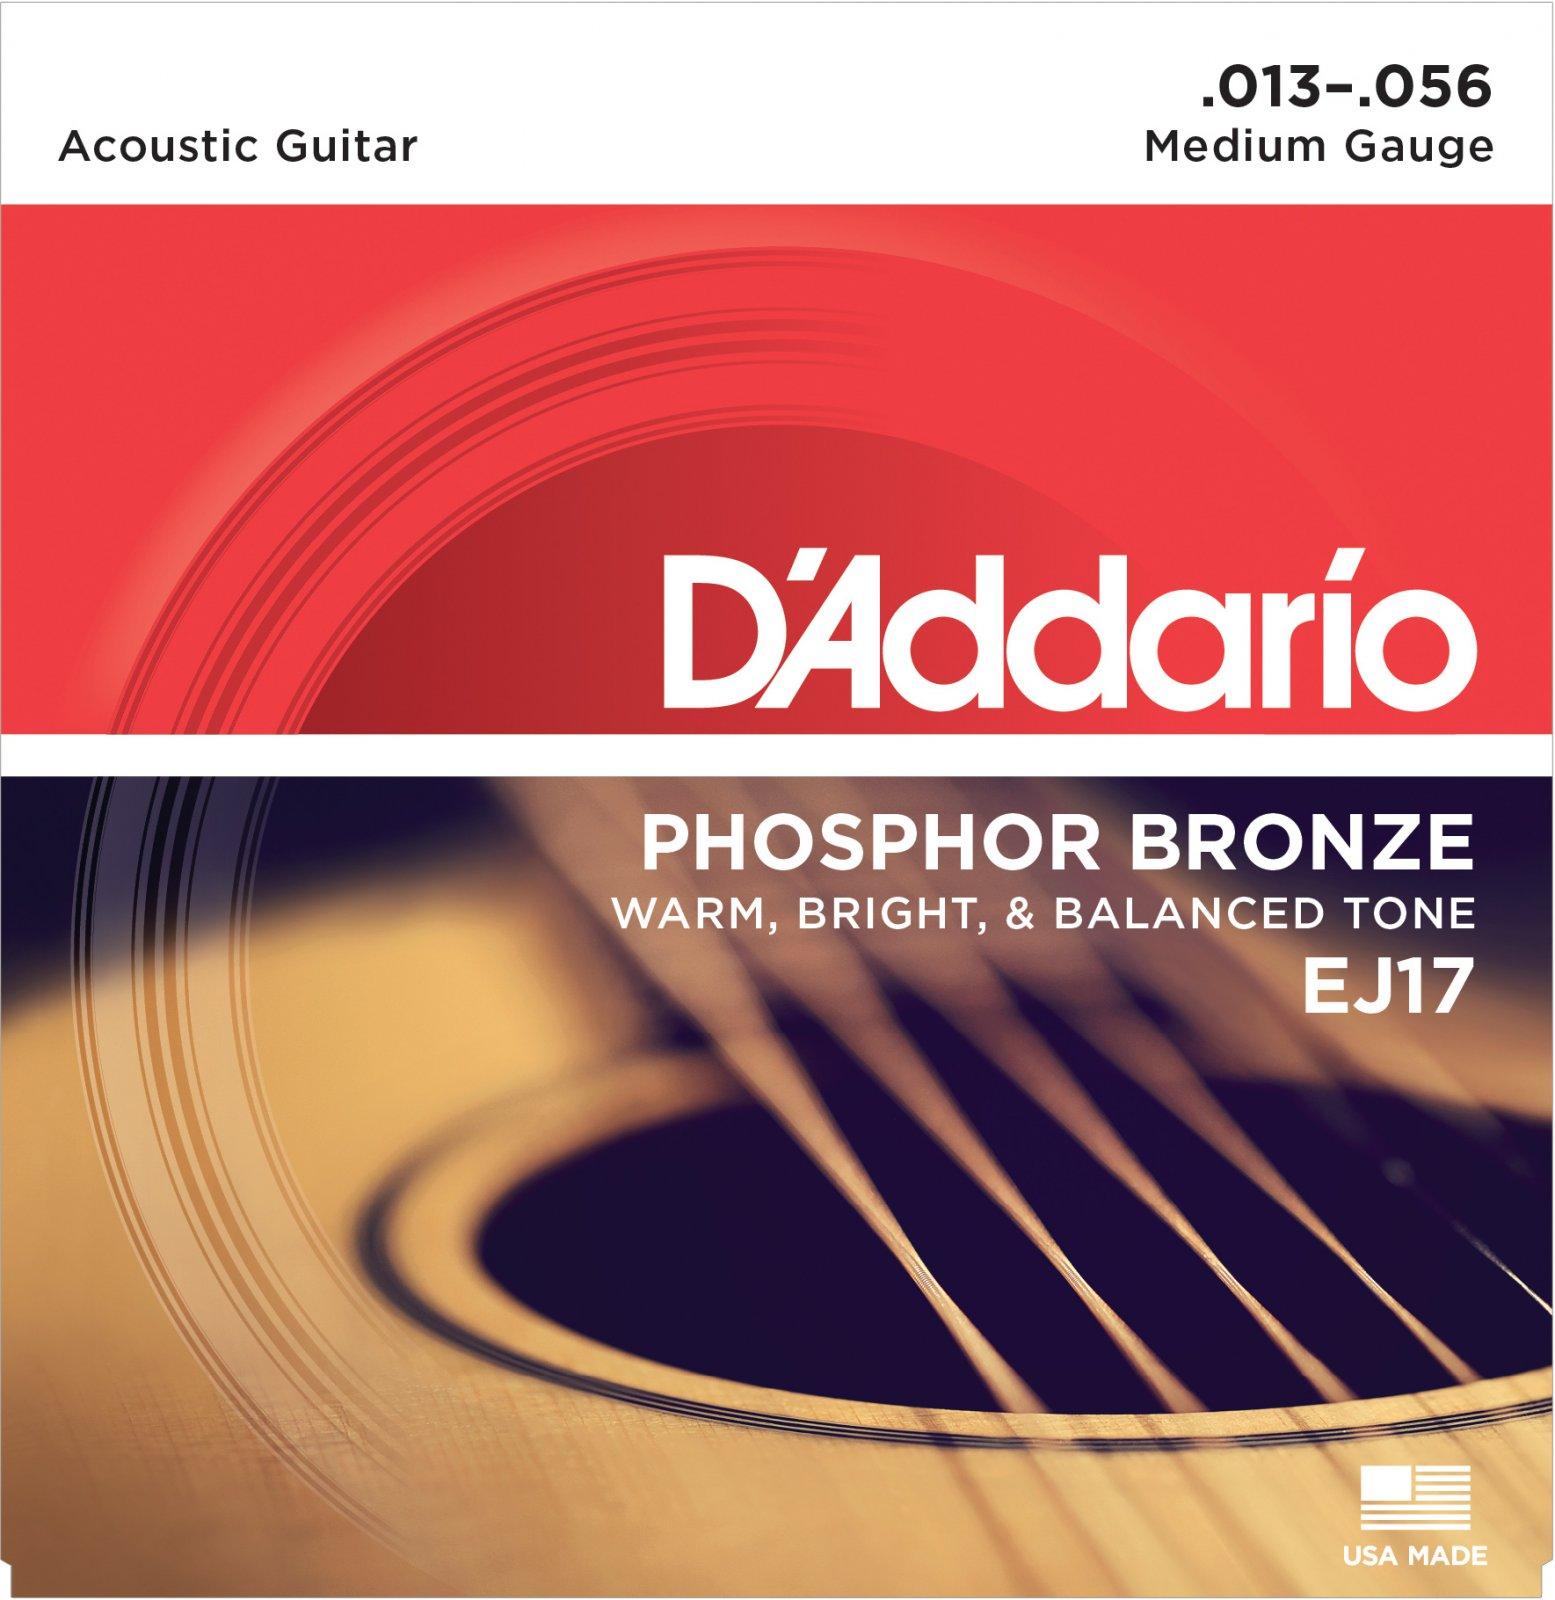 D'Addario Phosphor Bronze EJ17 Acoustic Guitar Strings, Medium, 13-56